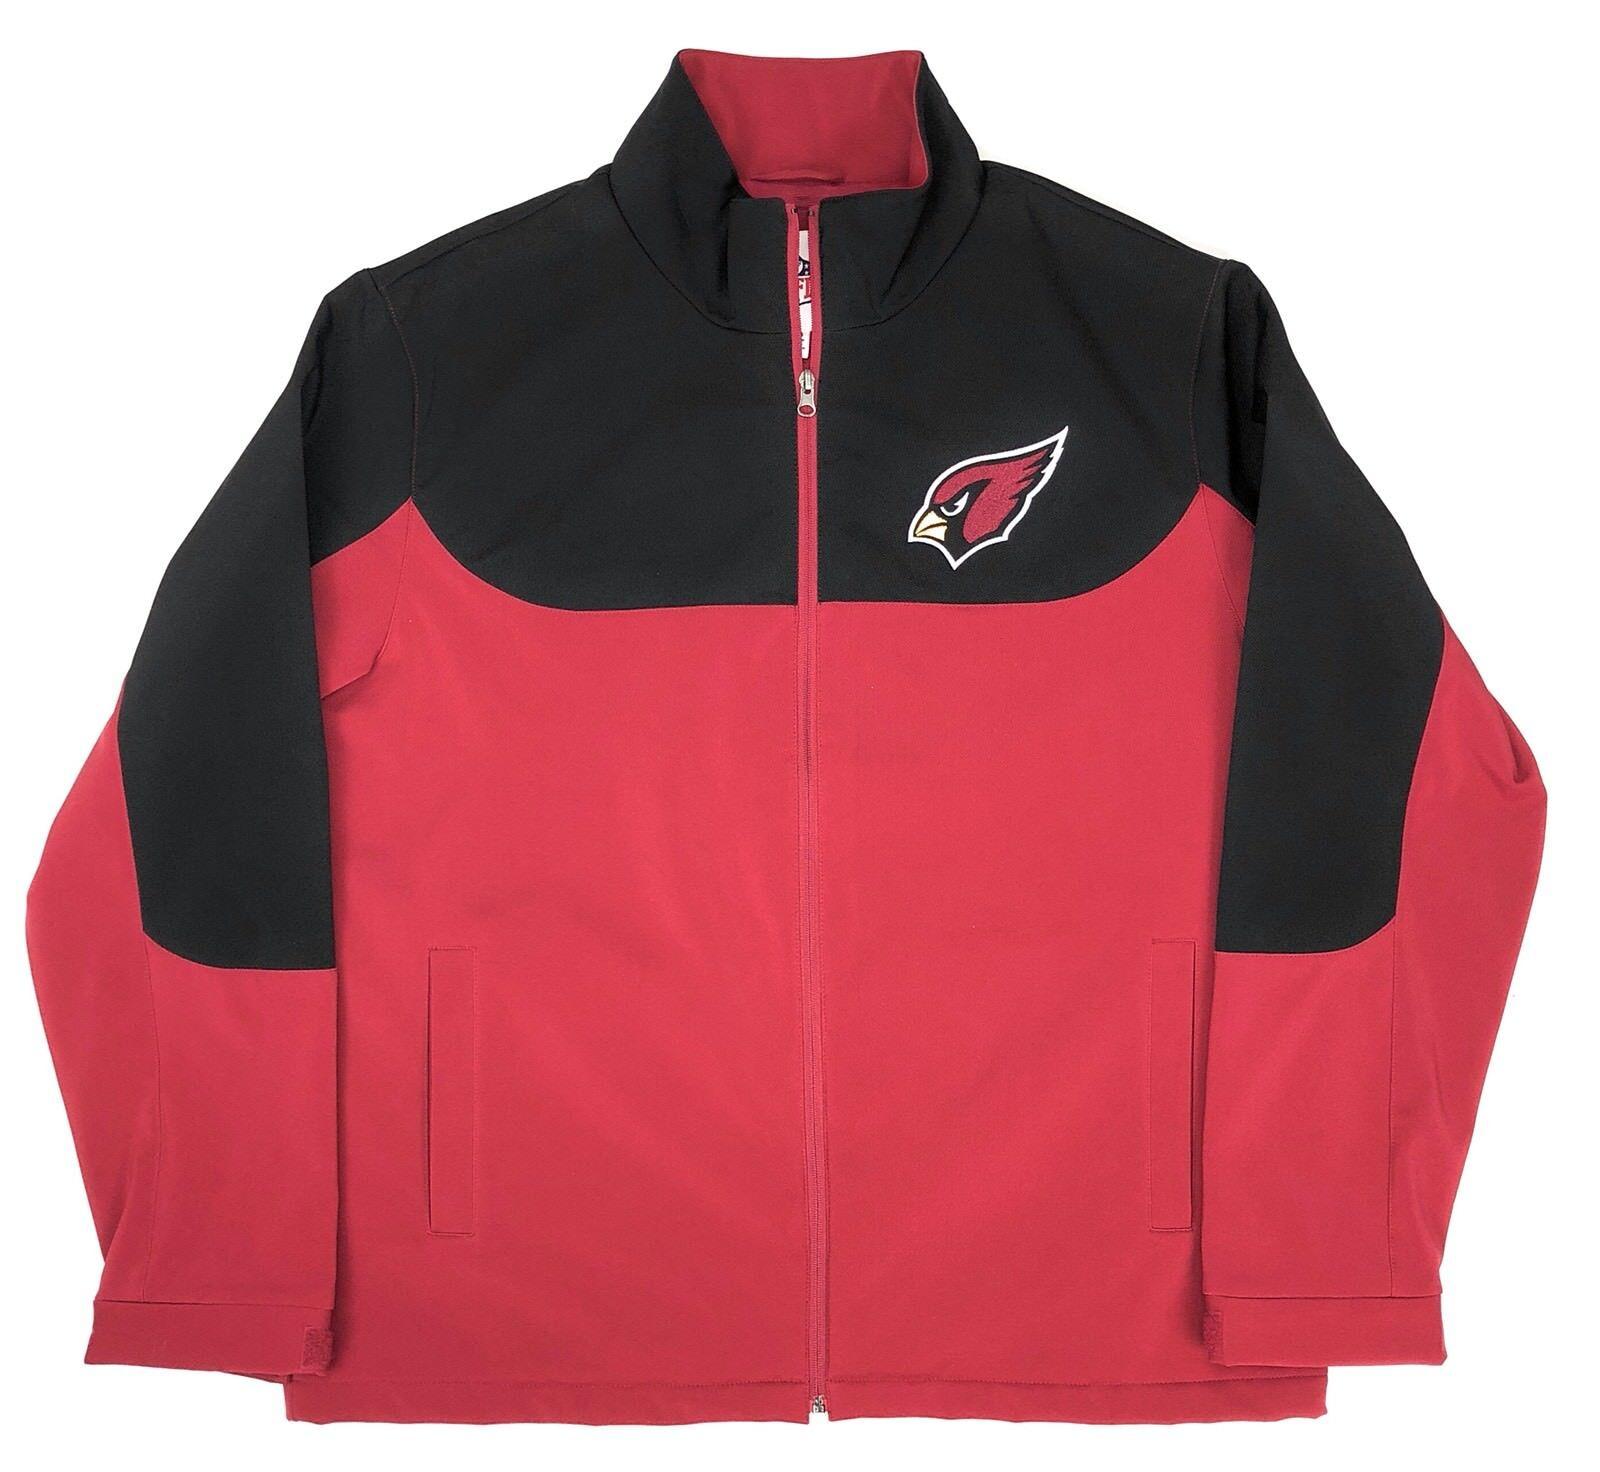 Arizona Cardinals Jacket Men's XL Polyester Stretch Vlies